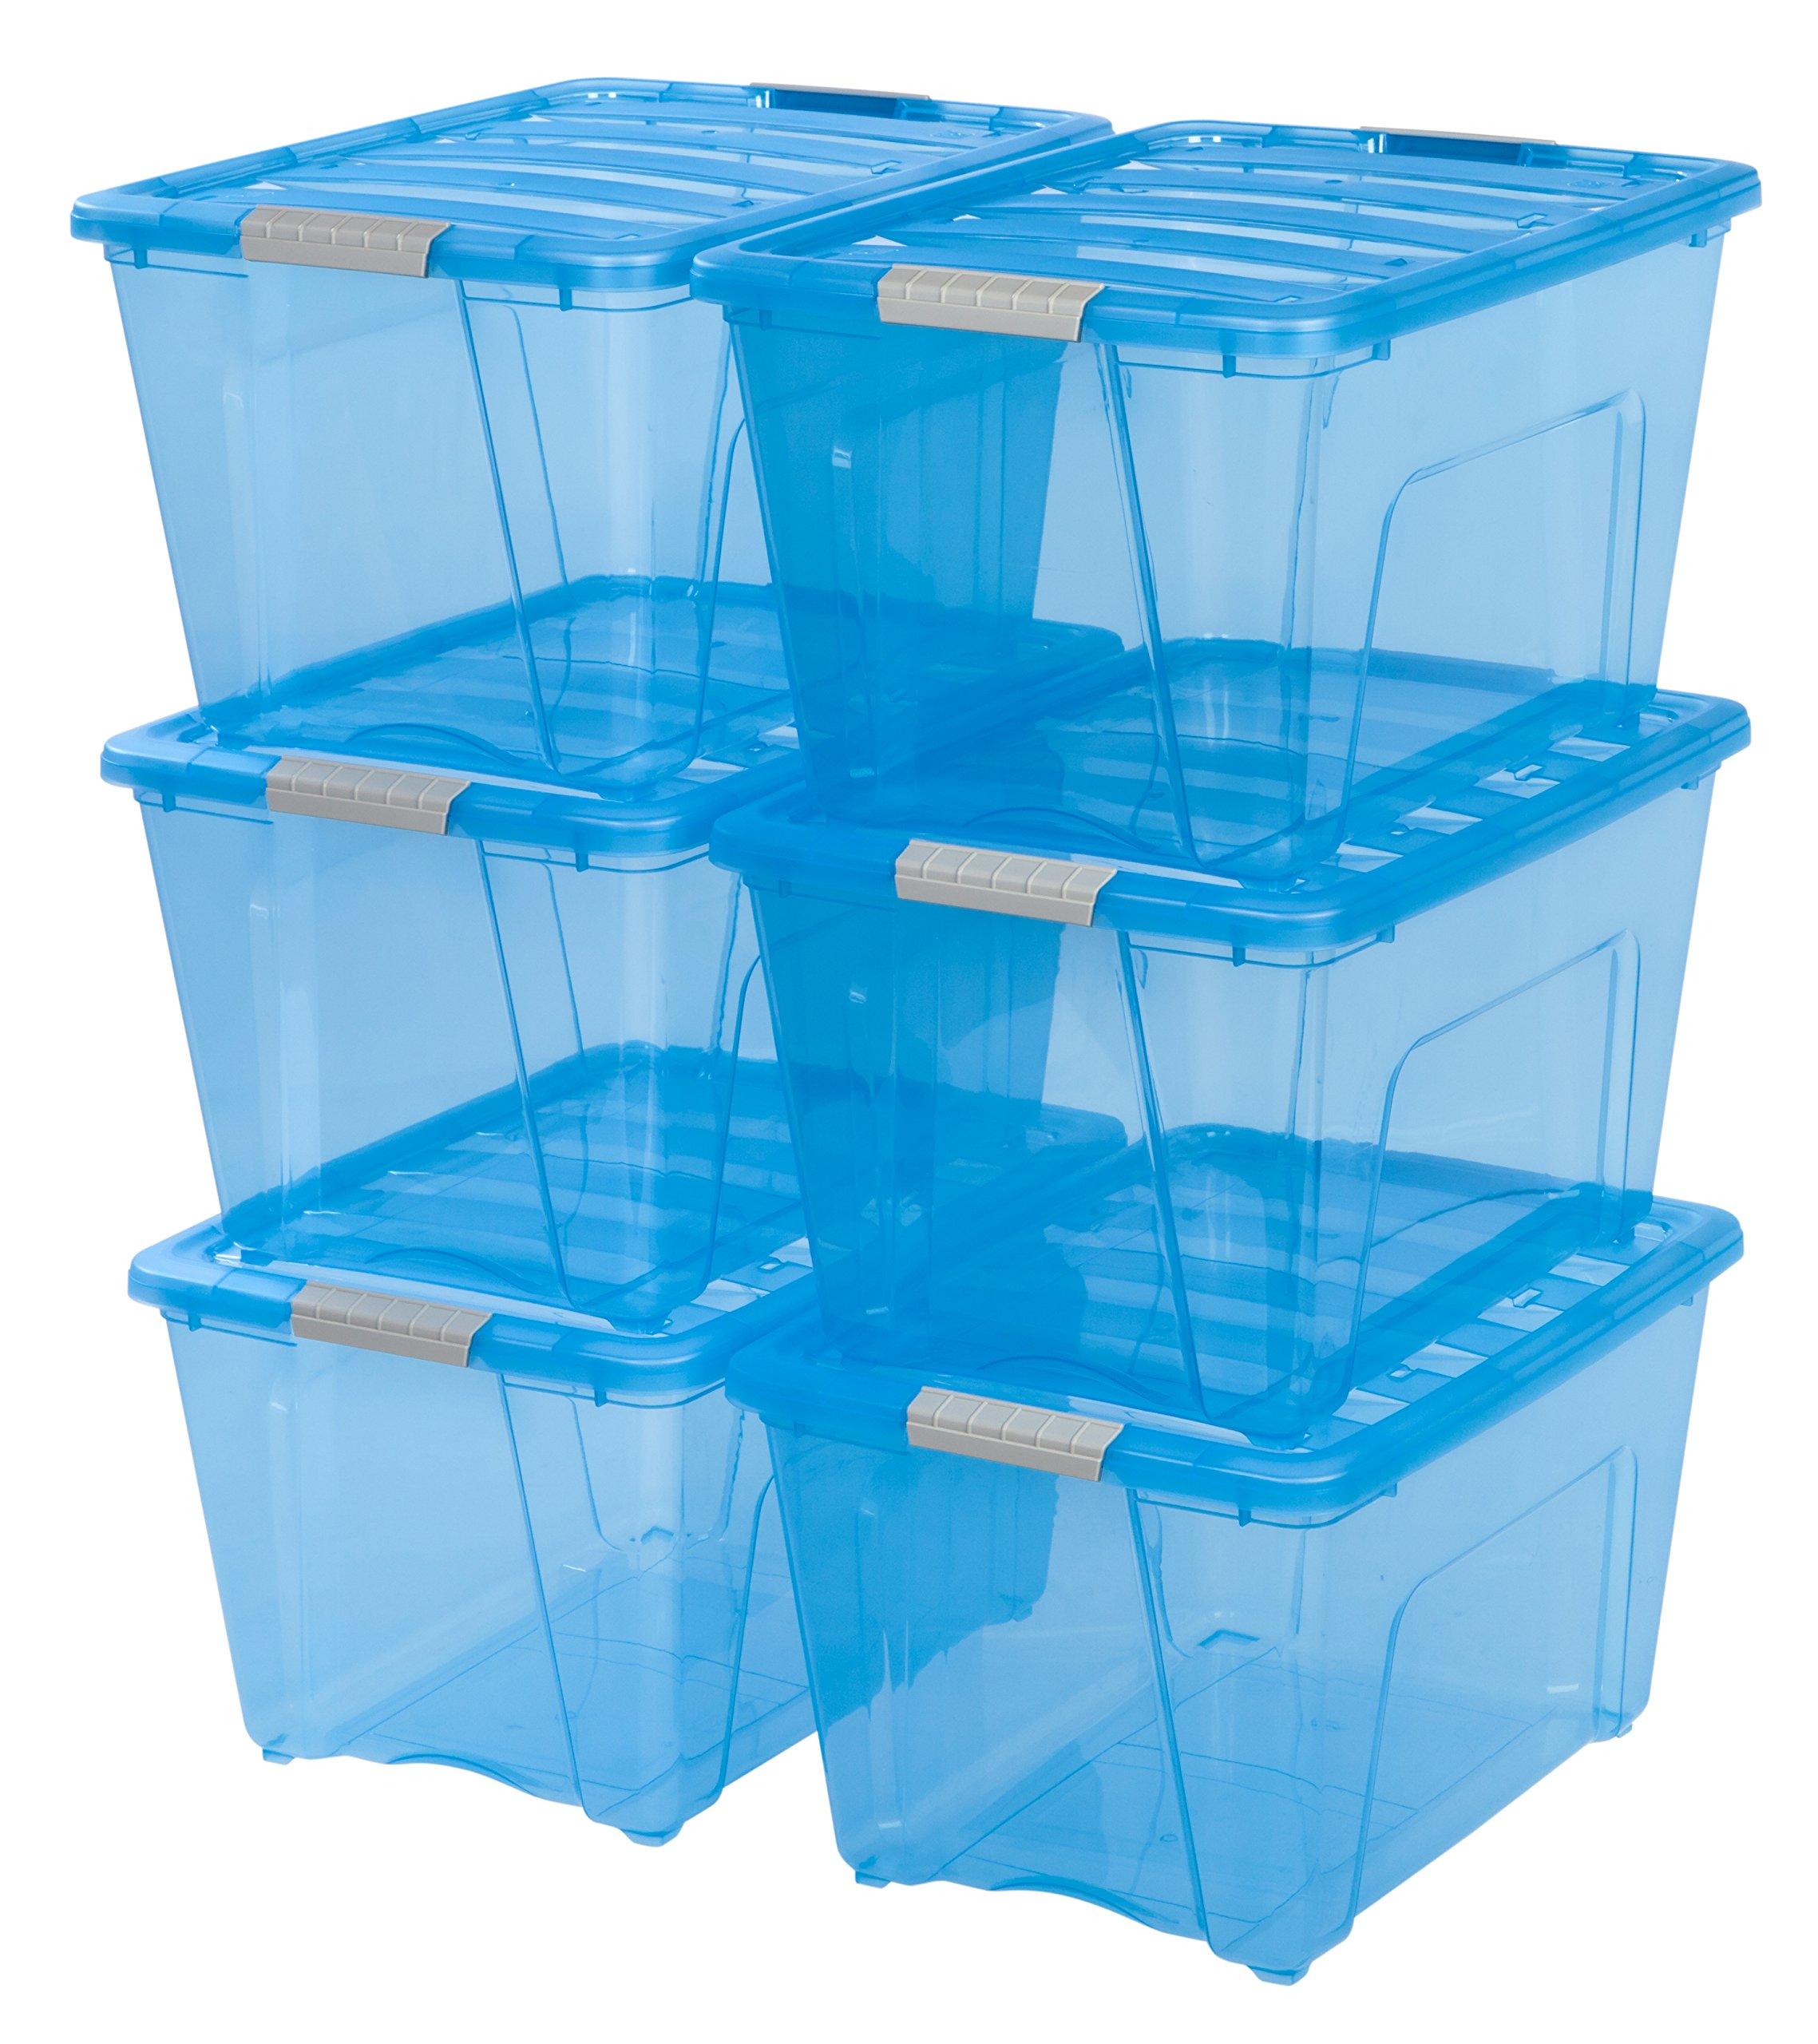 IRIS 53 Quart Stack & Pull Box, 6 Pack, Blue by IRIS USA, Inc.